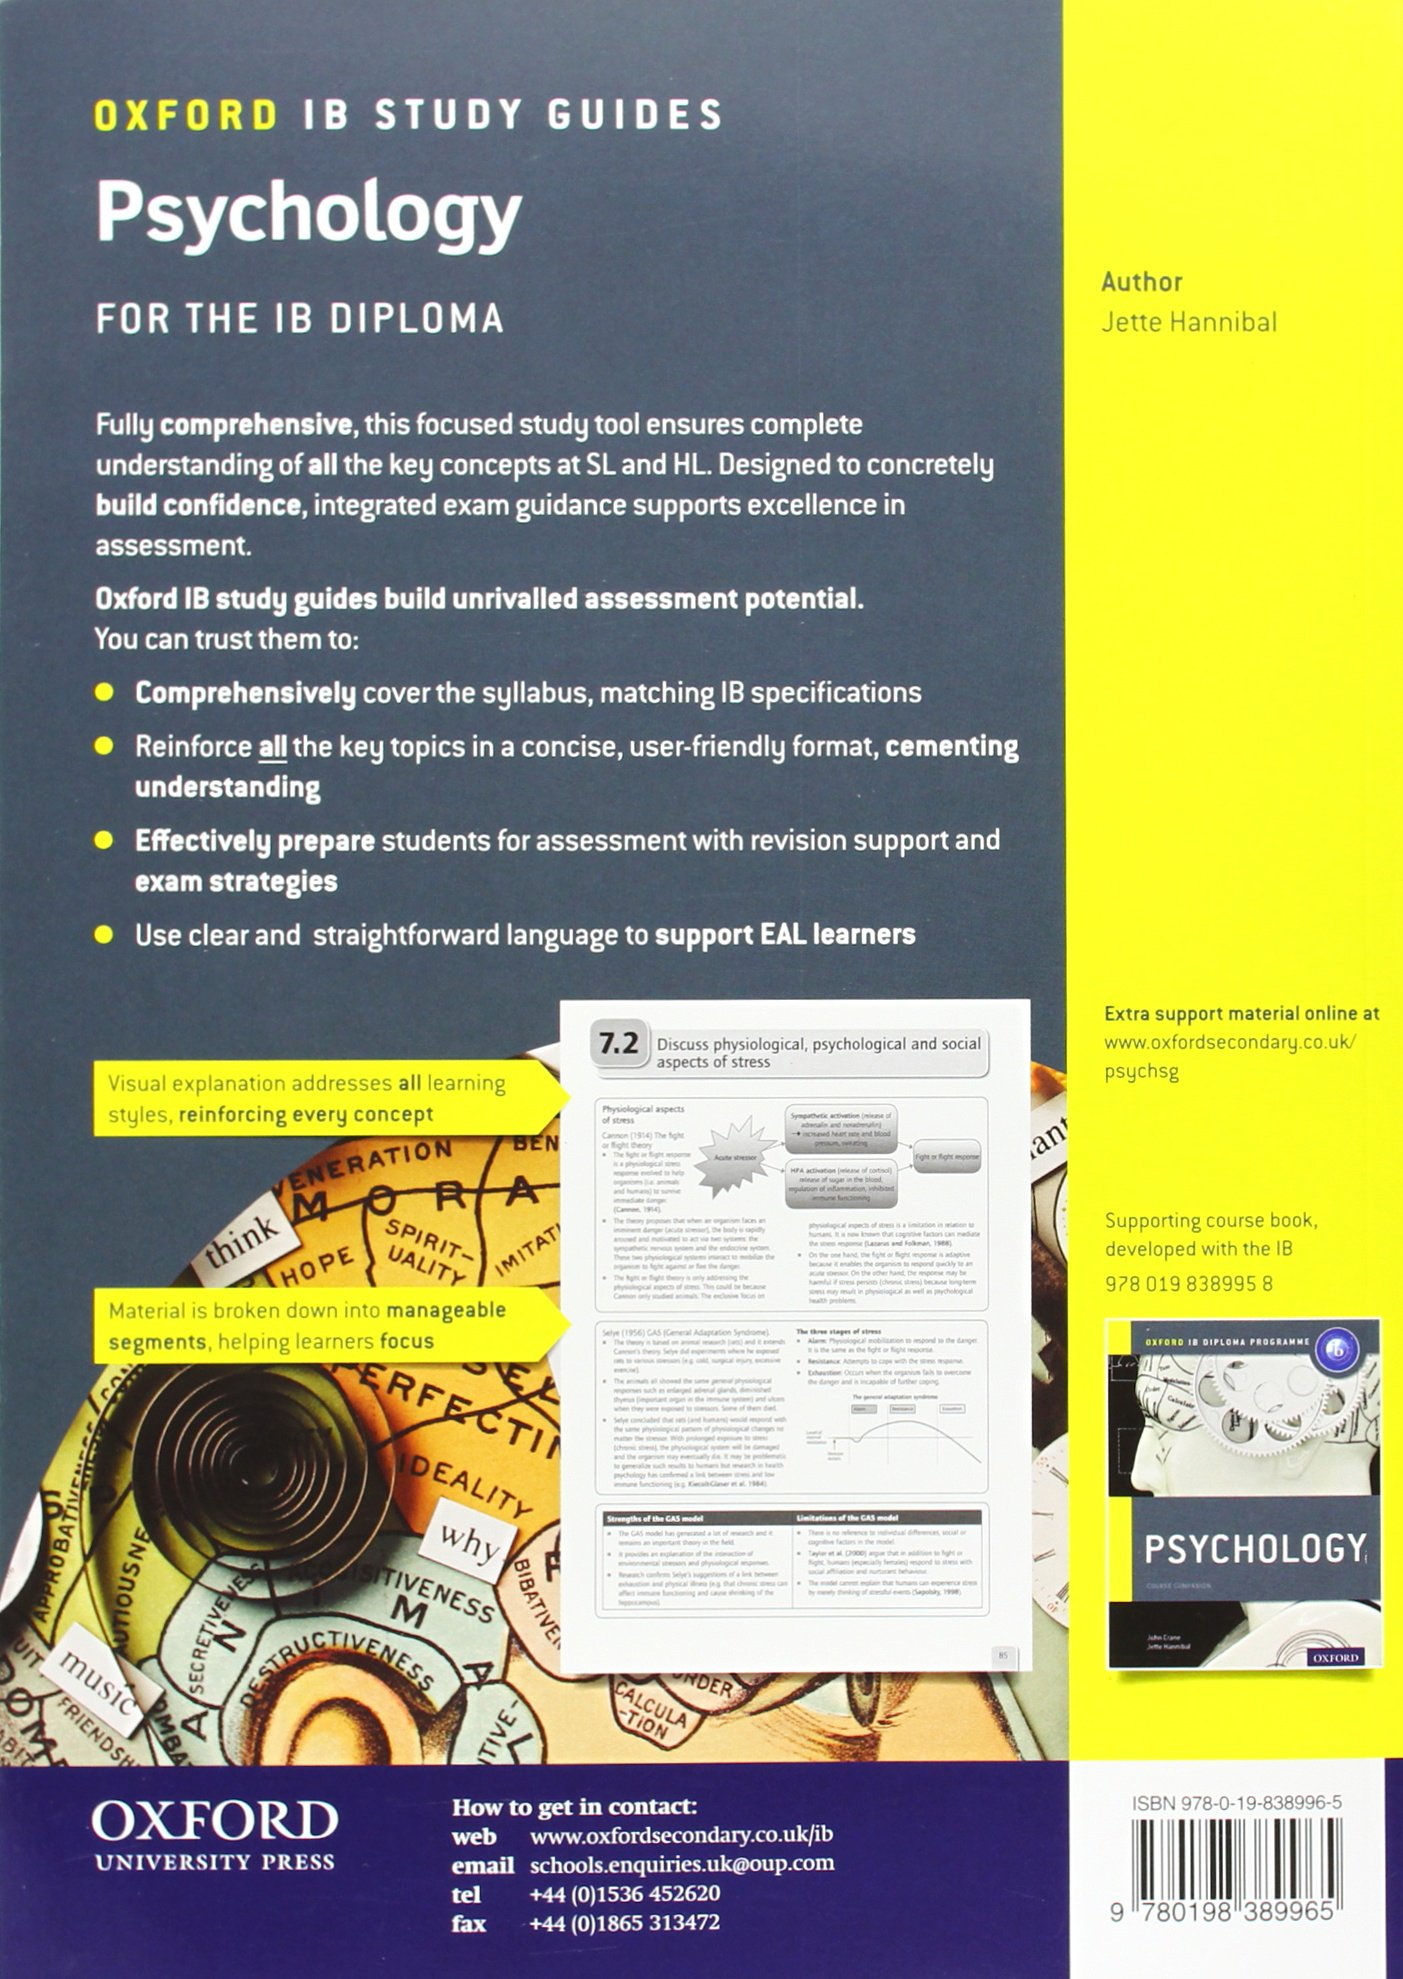 psychology study guide oxford ib diploma programme international rh amazon co uk ib psychology study guide oxford ib diploma program (international baccalaureate) All IB Study Guides